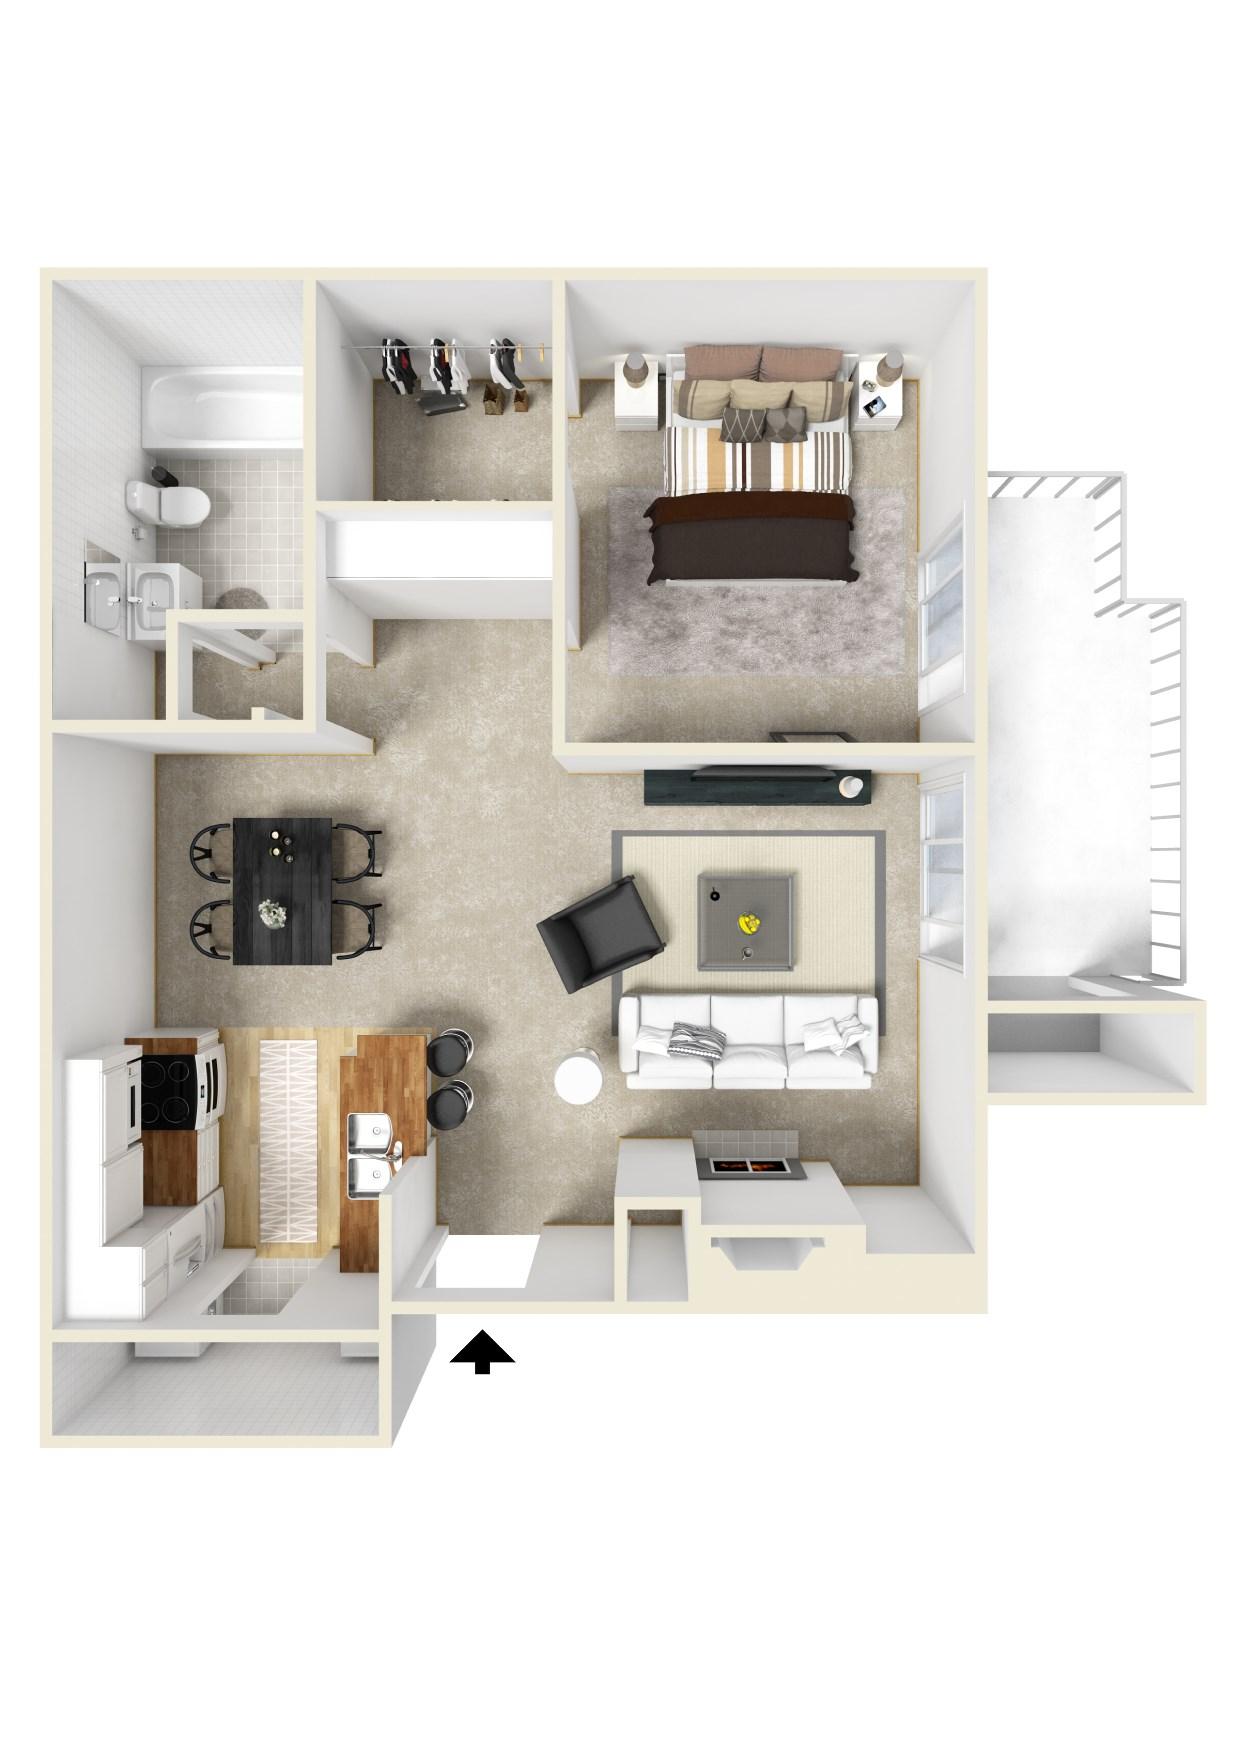 Wondrous Rooms For Rent Virginia Beach Va Apartments House Download Free Architecture Designs Scobabritishbridgeorg